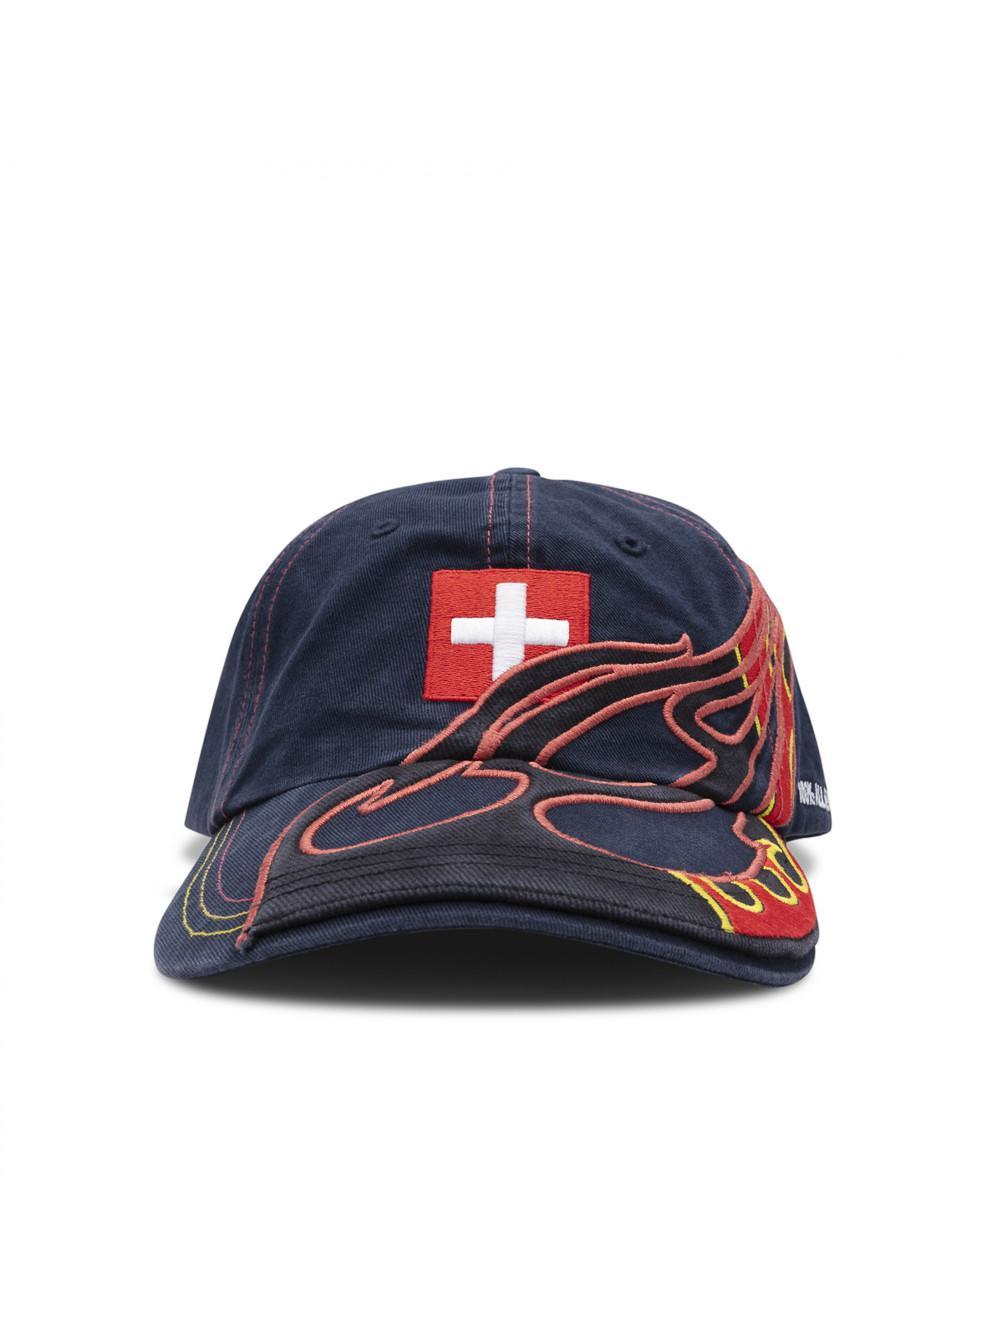 Vetements Cotton Baseball Cap in Blue - Save 30.11363636363636% - Lyst bcf1cbf913bd